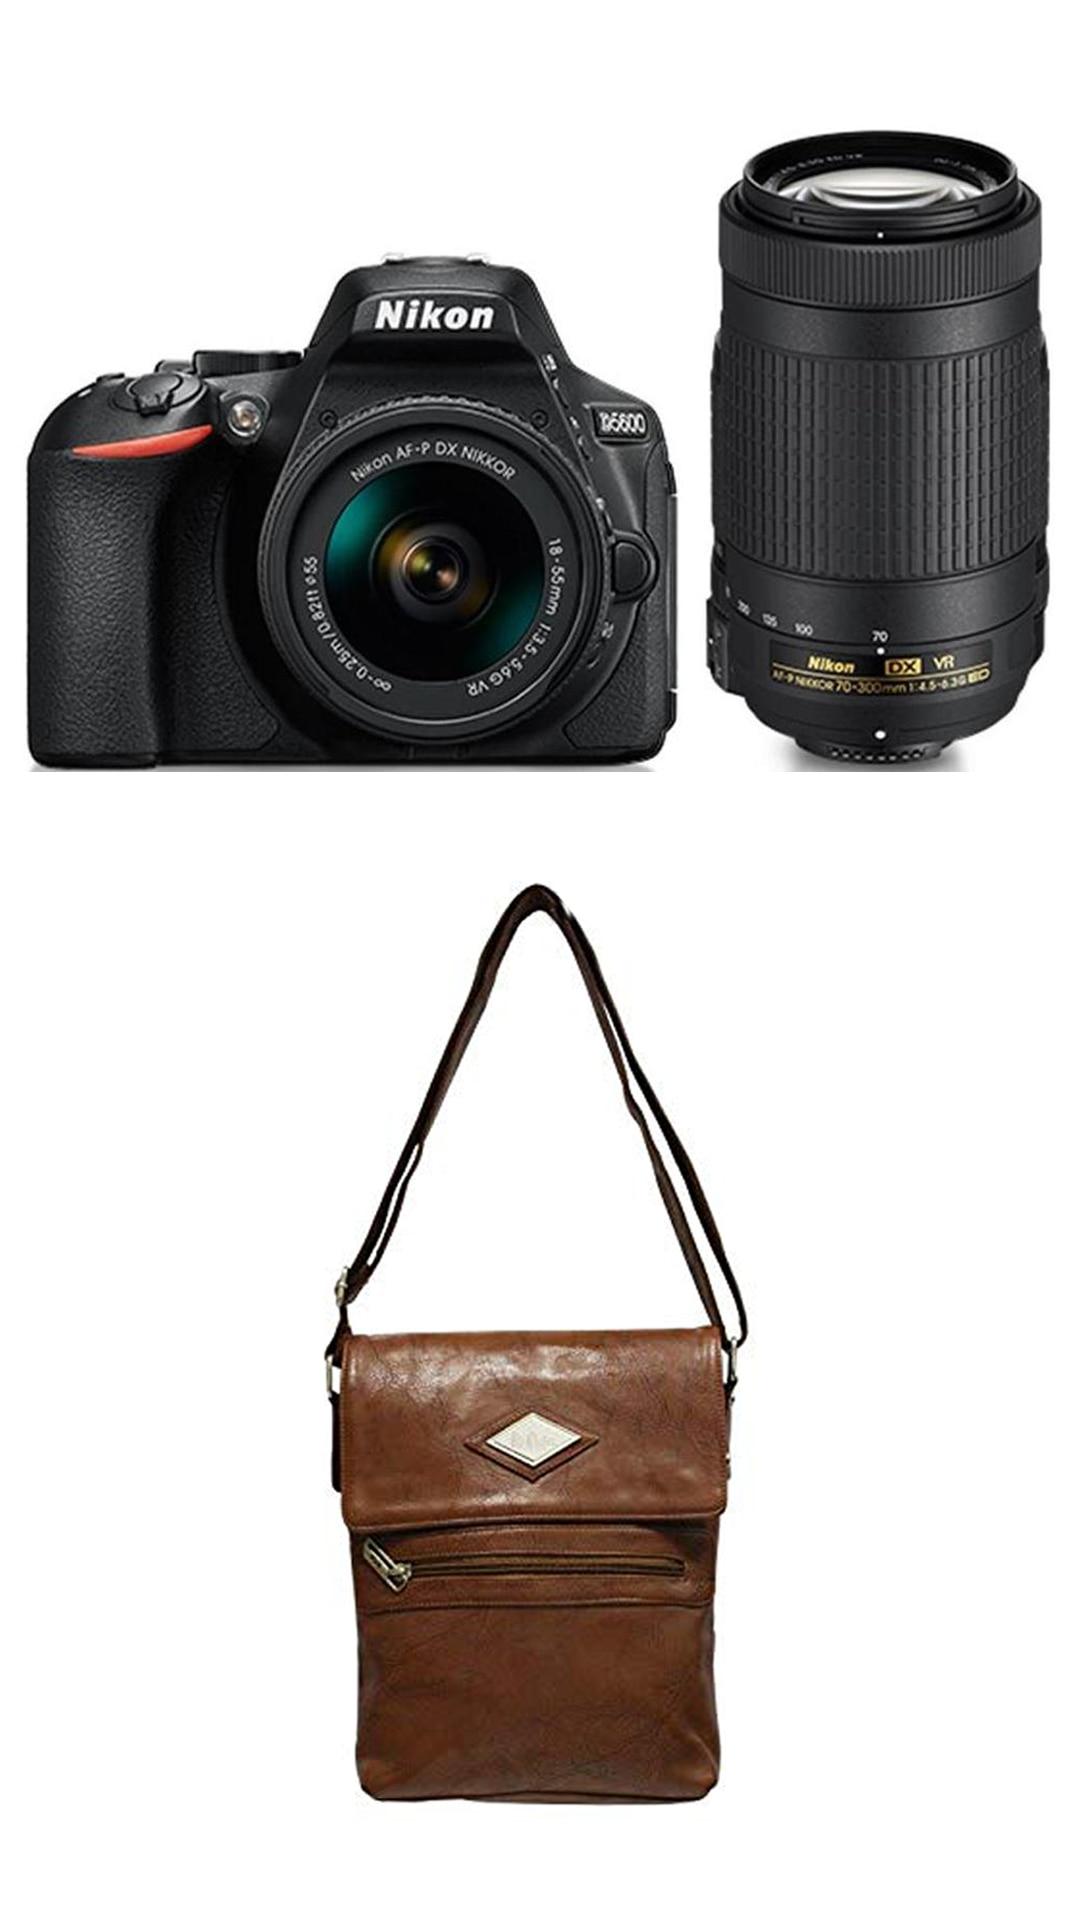 Nikon D5600 Kit (AF-P DX 18-55 Mm VR + AF-P DX NIKKOR 70-300mm F/4.5-6.3G ED VR Kit Lenses) 24.2 MP DSLR Camera (Black) + FREE Nikon DSLR Bag + 16GB Memory Card - Free Lee Cooper Sling Bag